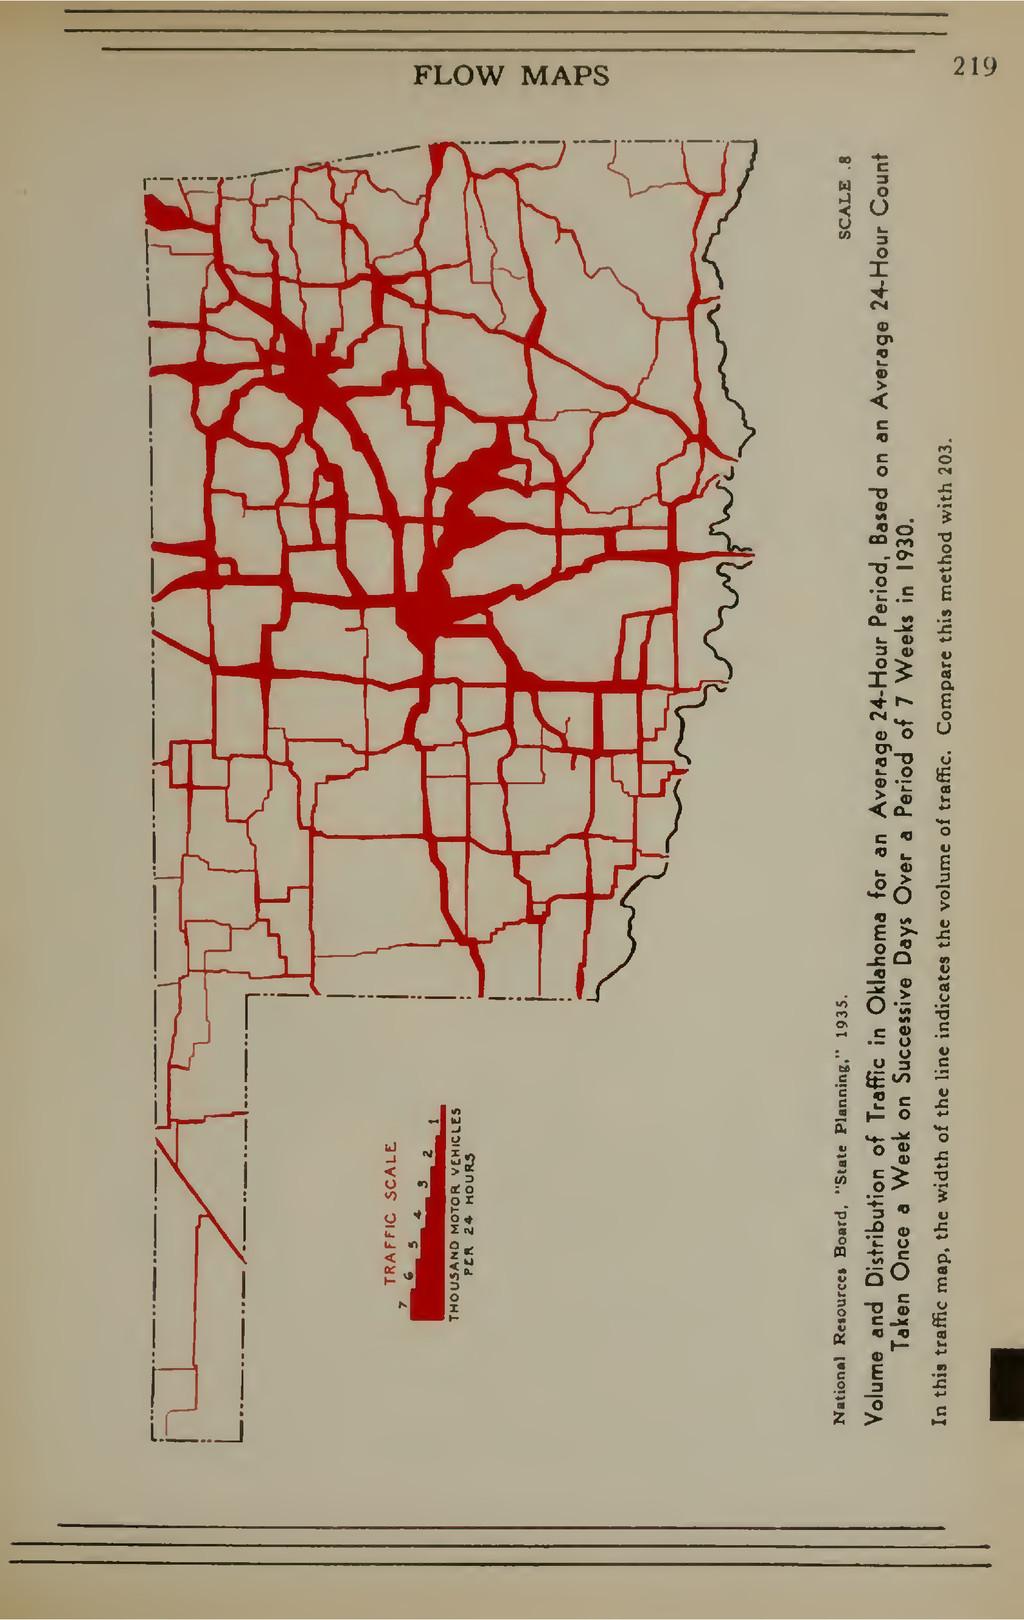 FLOW MAPS 219